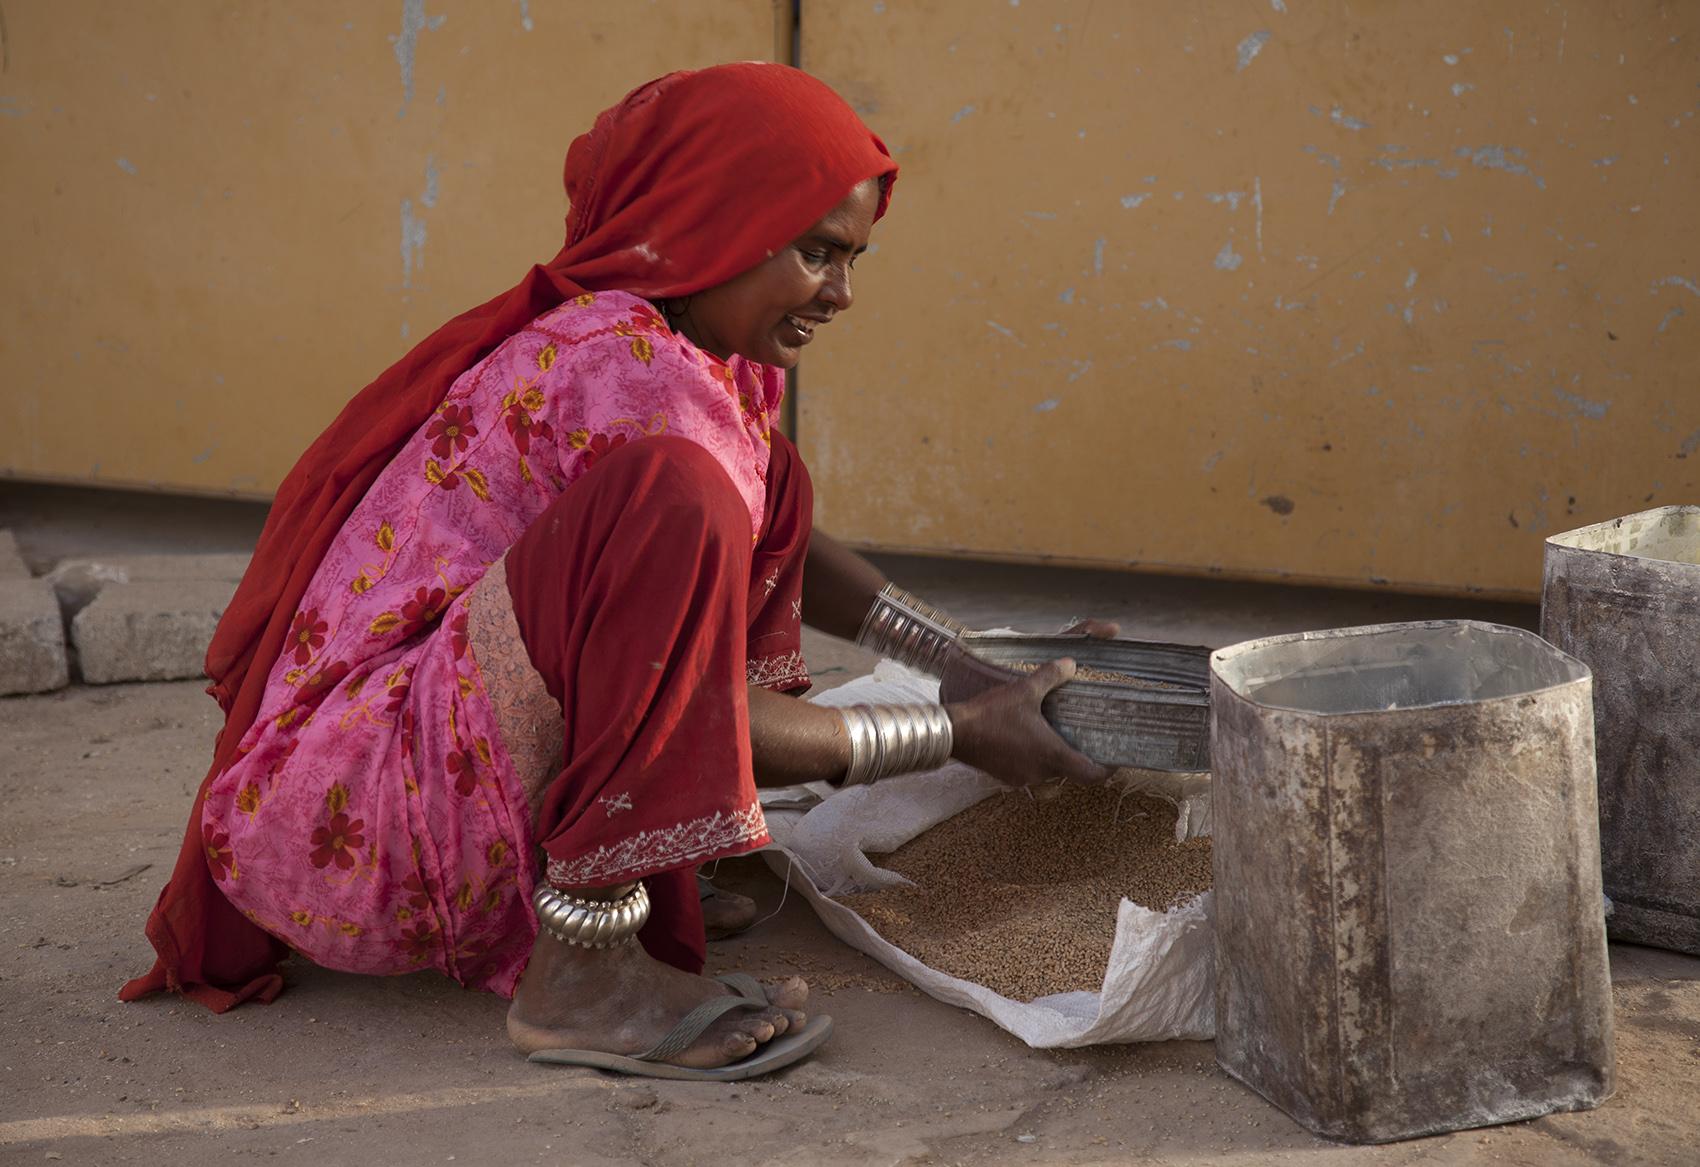 Sifting grain, Bhujodi, India